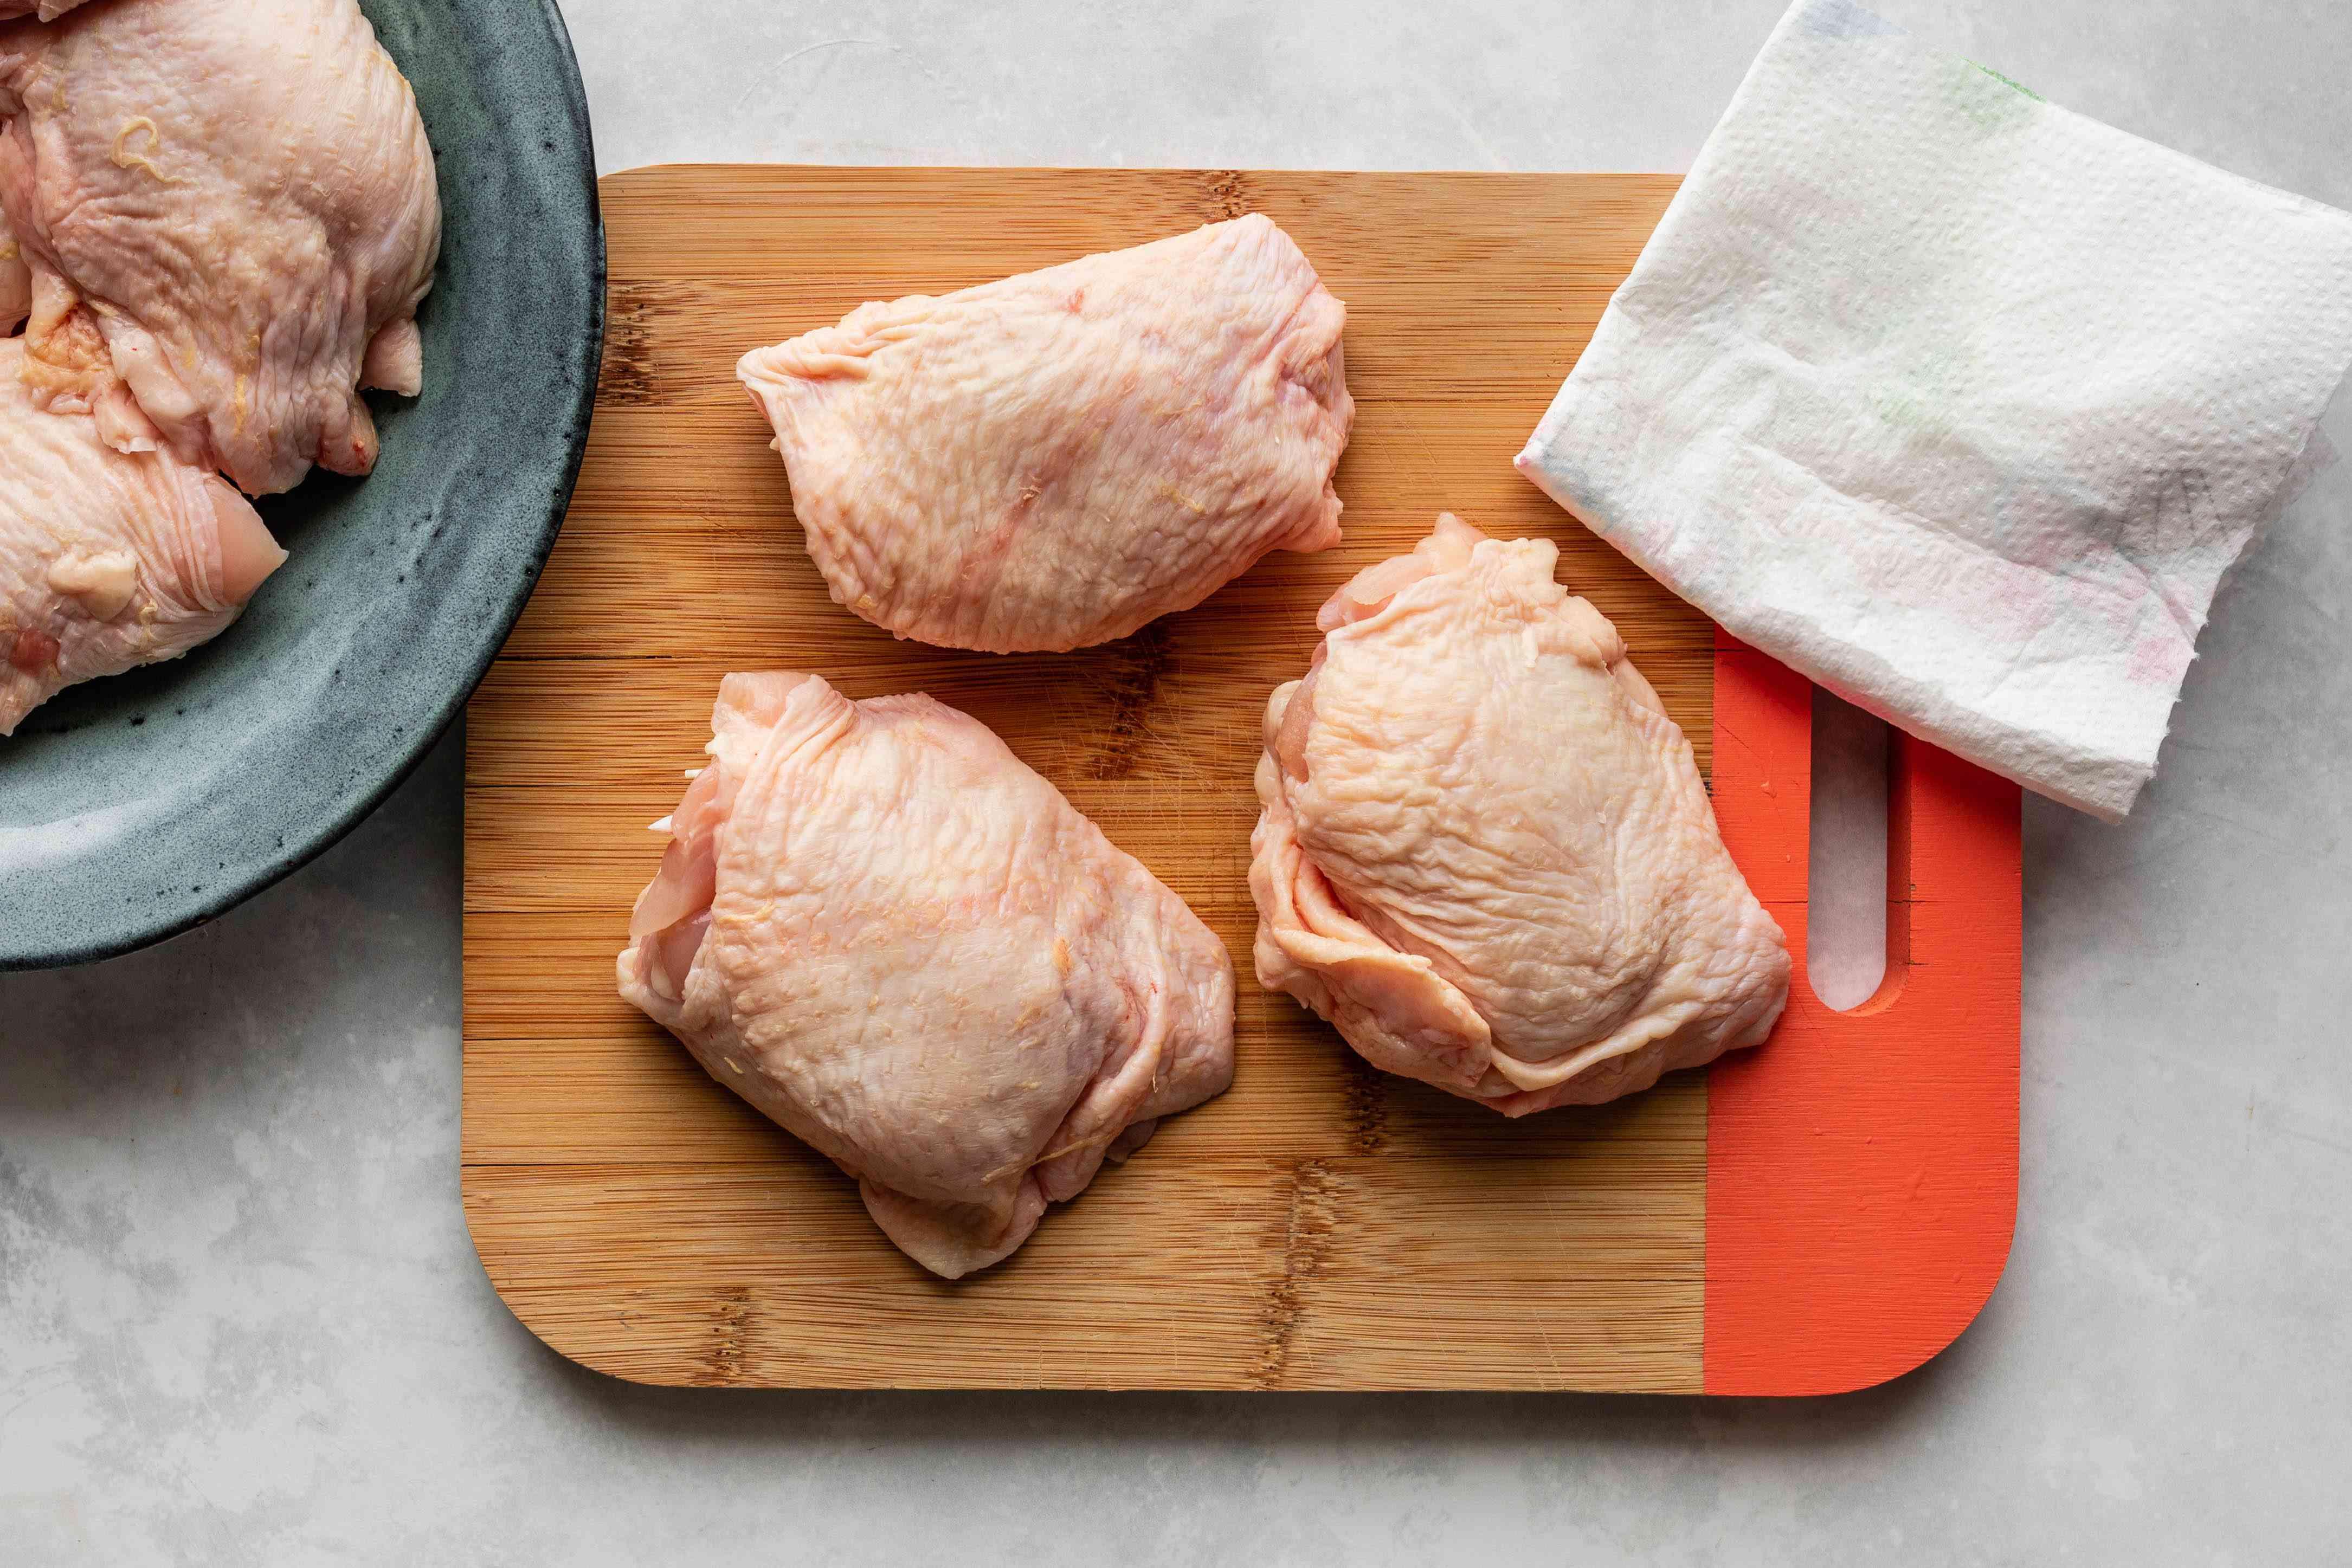 Pat chicken